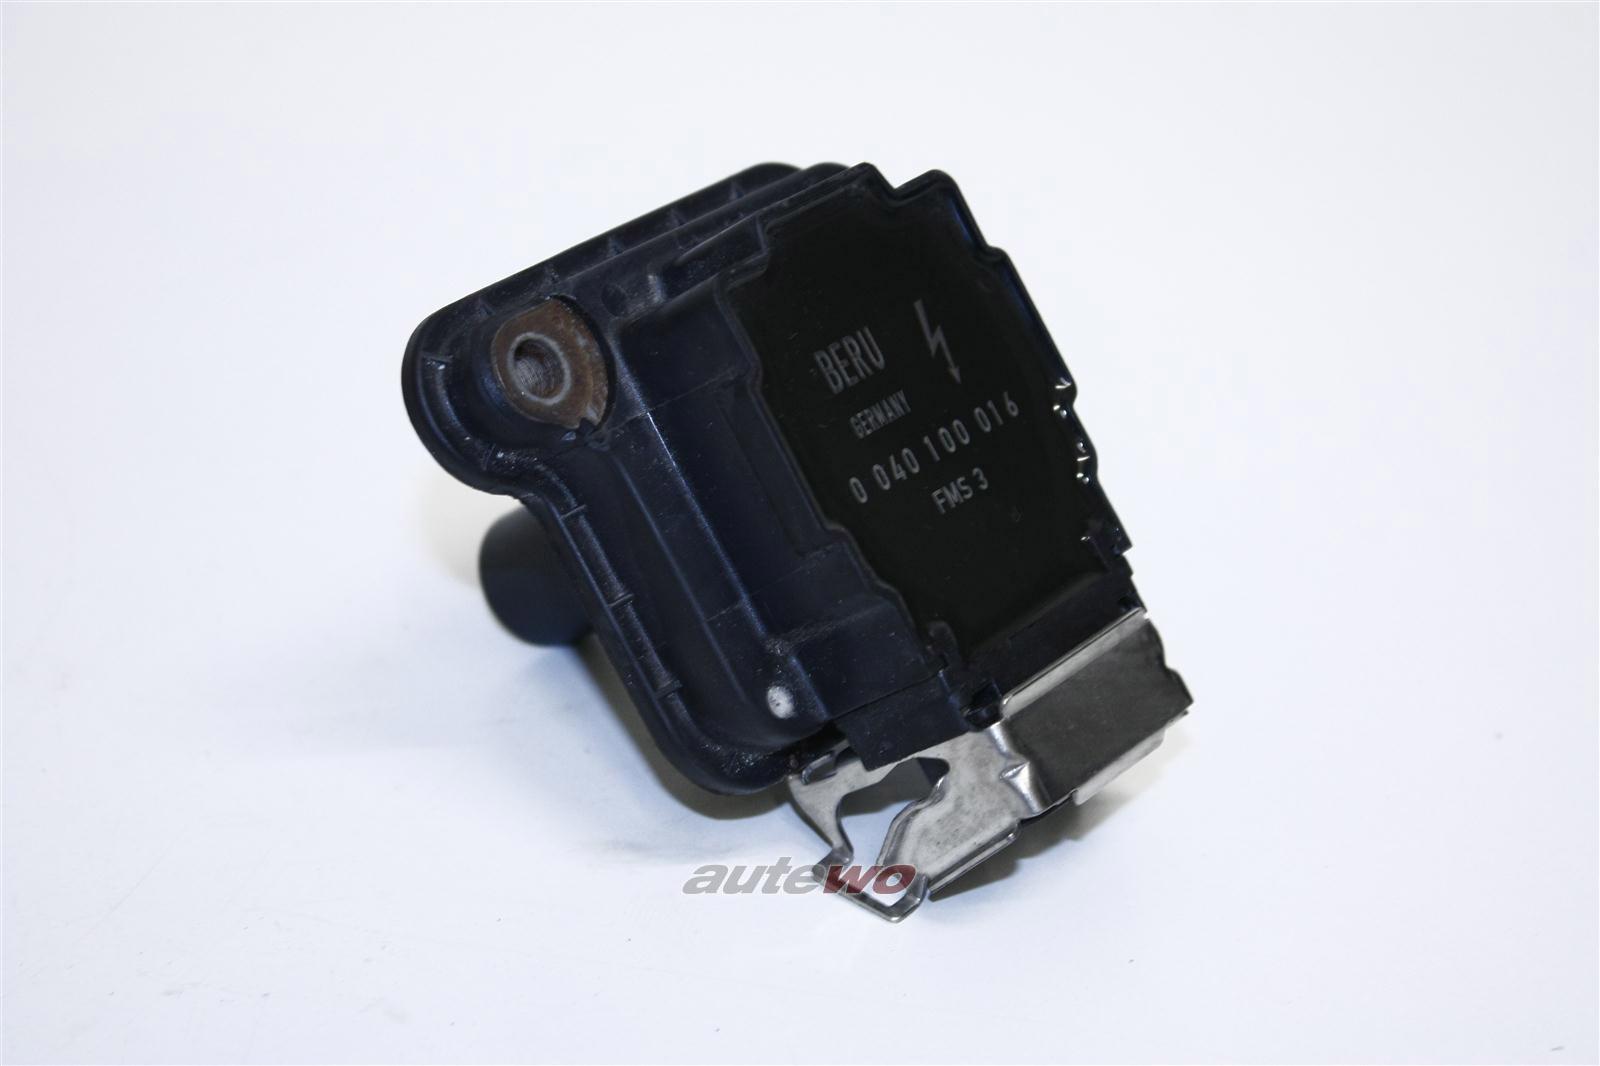 Audi A3/A4/A6/A8 1.8T/2.7T/2.8l div. 4/6/8 Zylinder Zündspule neuw. 058905105